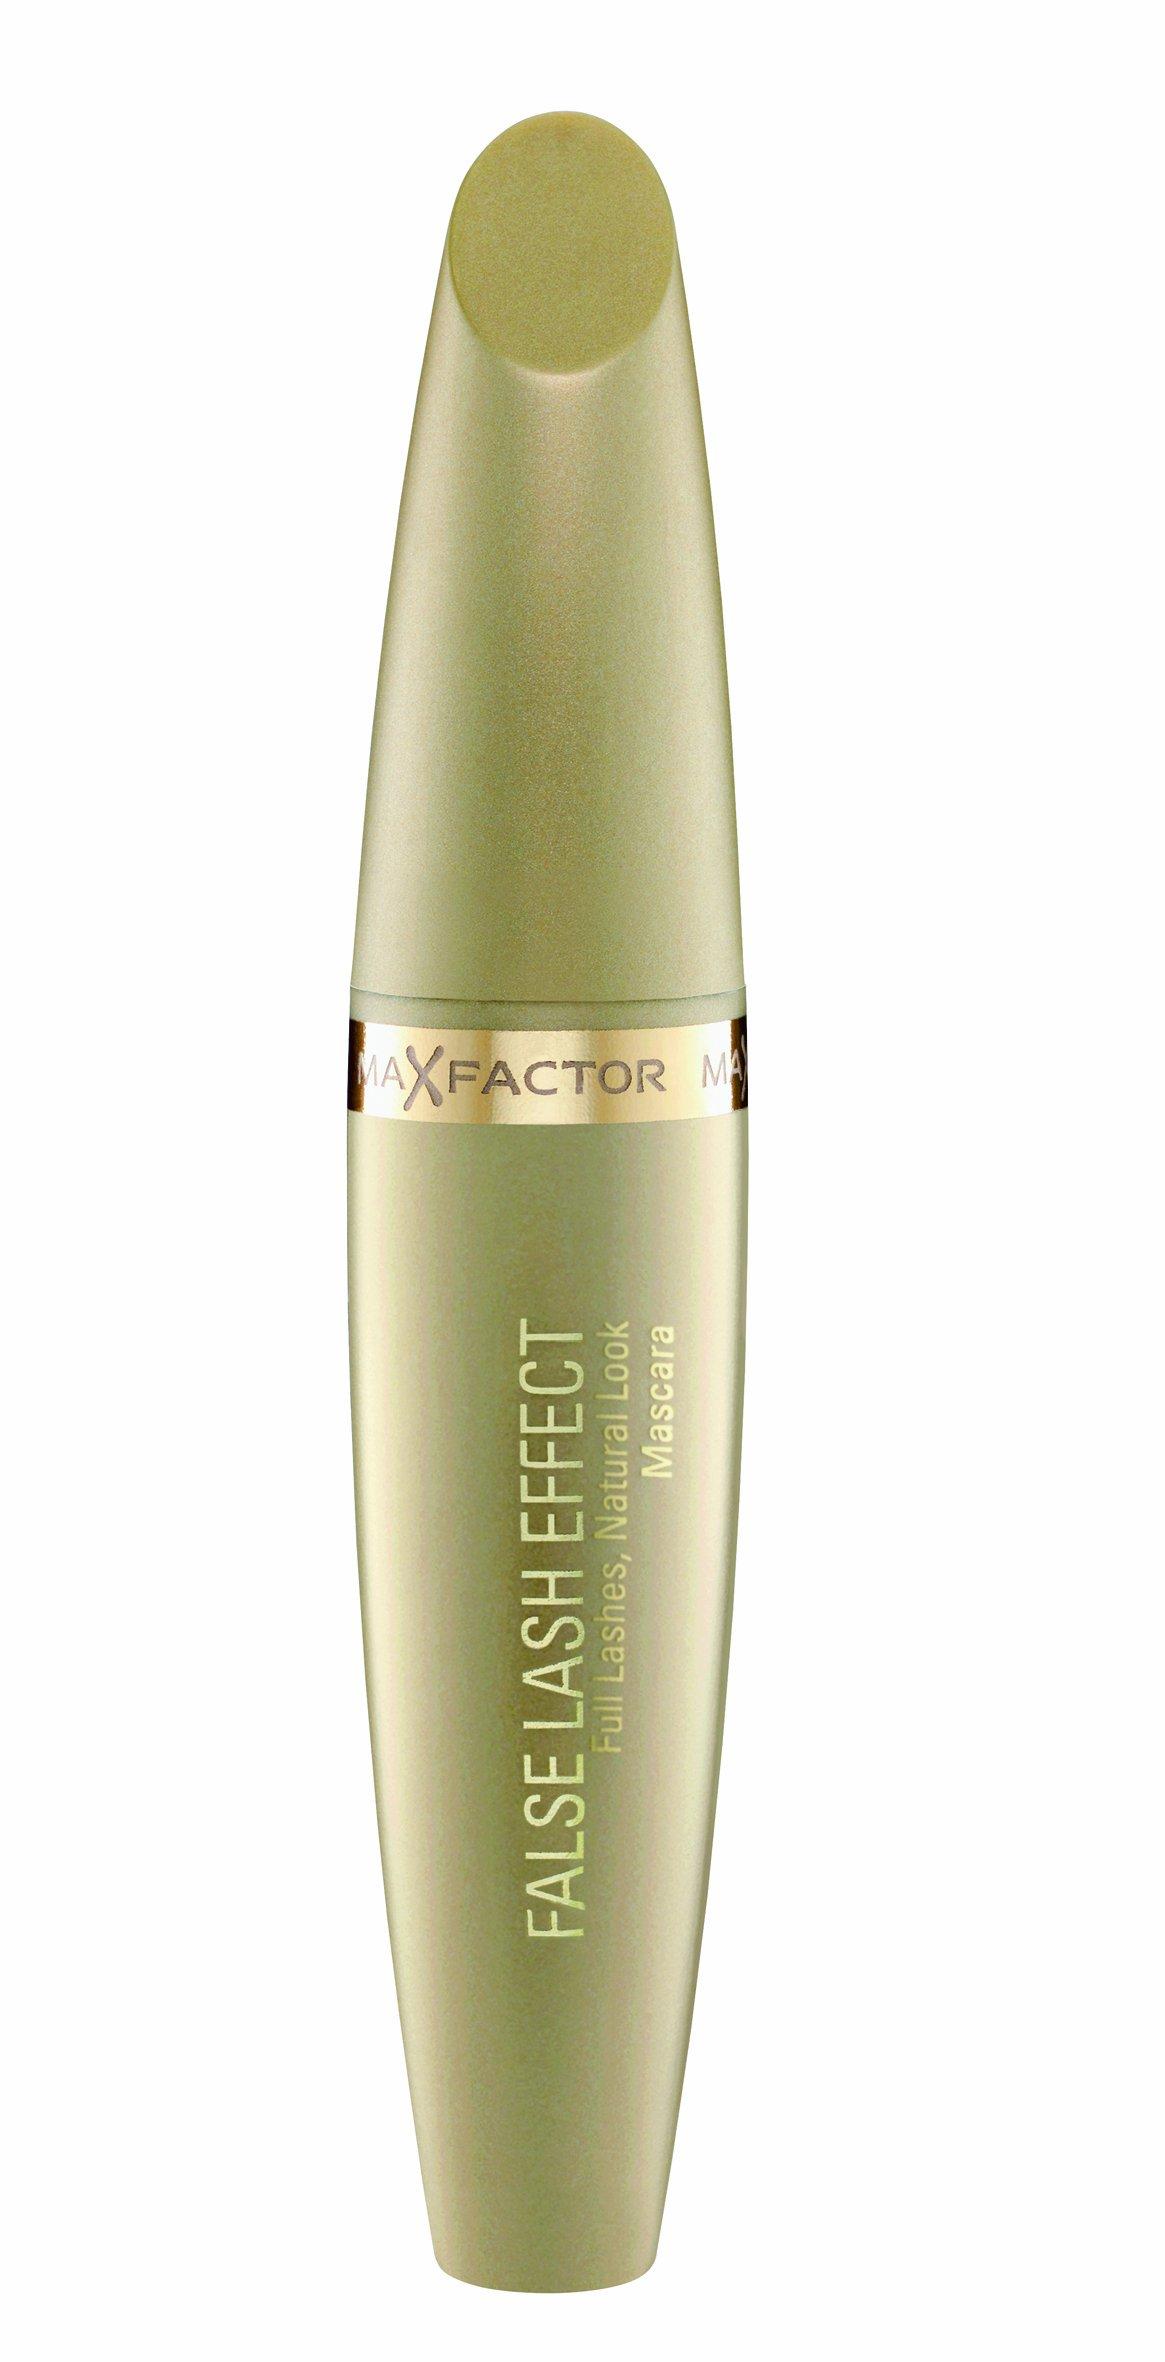 Max Factor False Lash Effect Mascara Black ( Gold Tube )